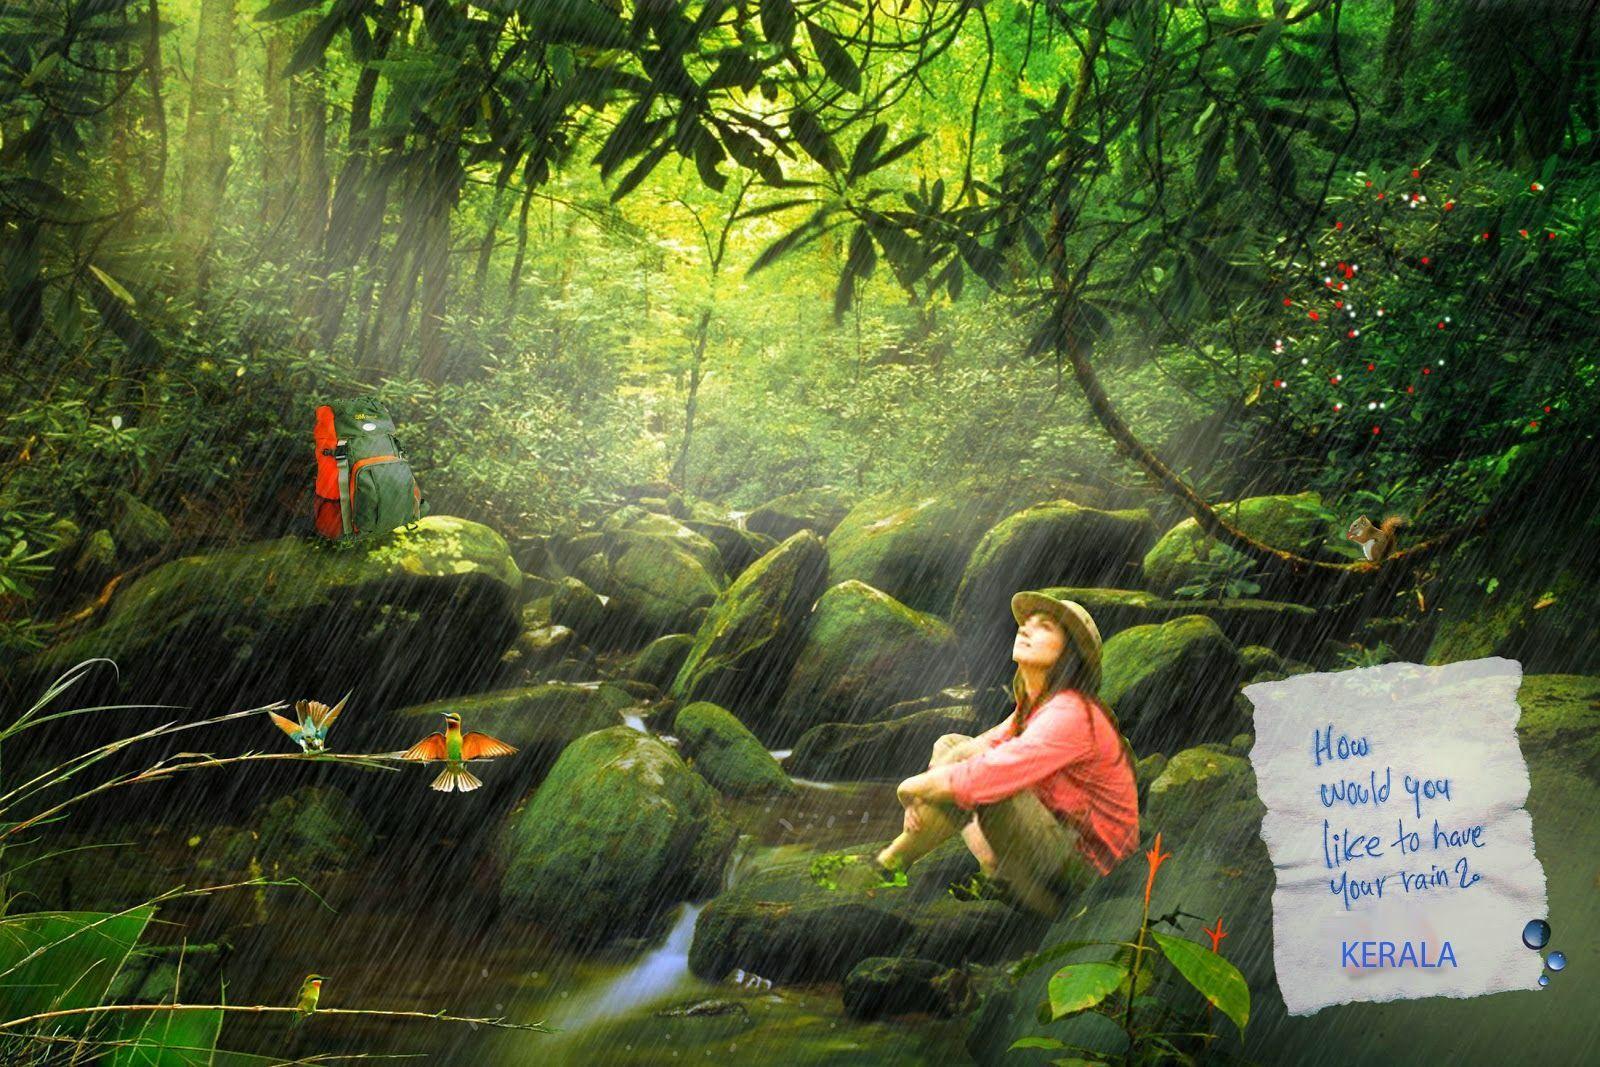 Kerala Nature Rain Hd Wallpapers In 2021 Hd Wallpaper Trip Travel Fun